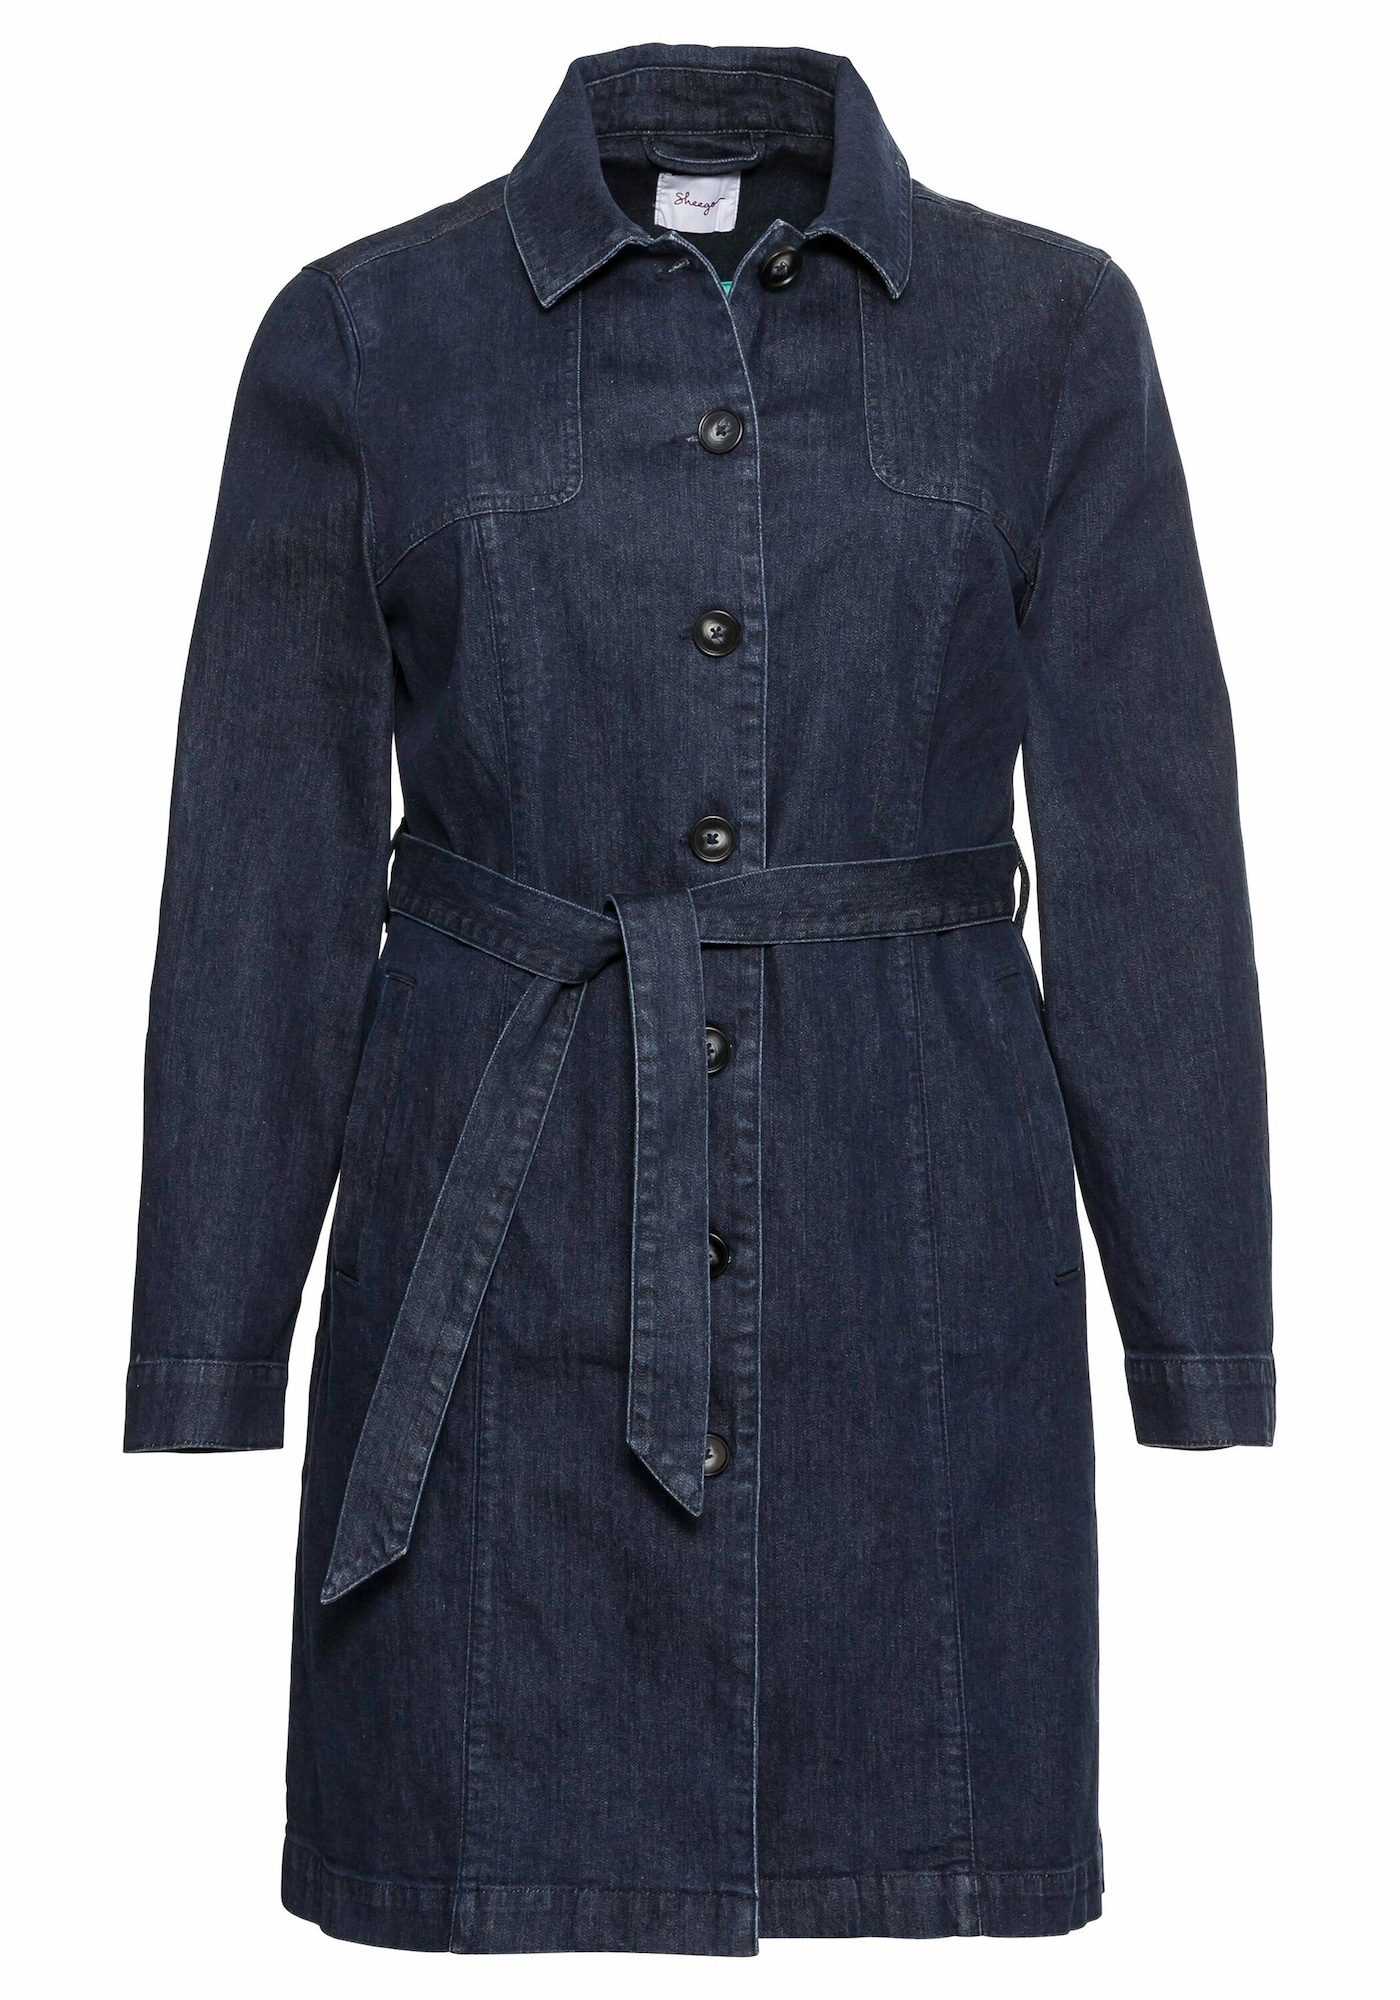 SHEEGO Demisezoninis paltas tamsiai mėlyna